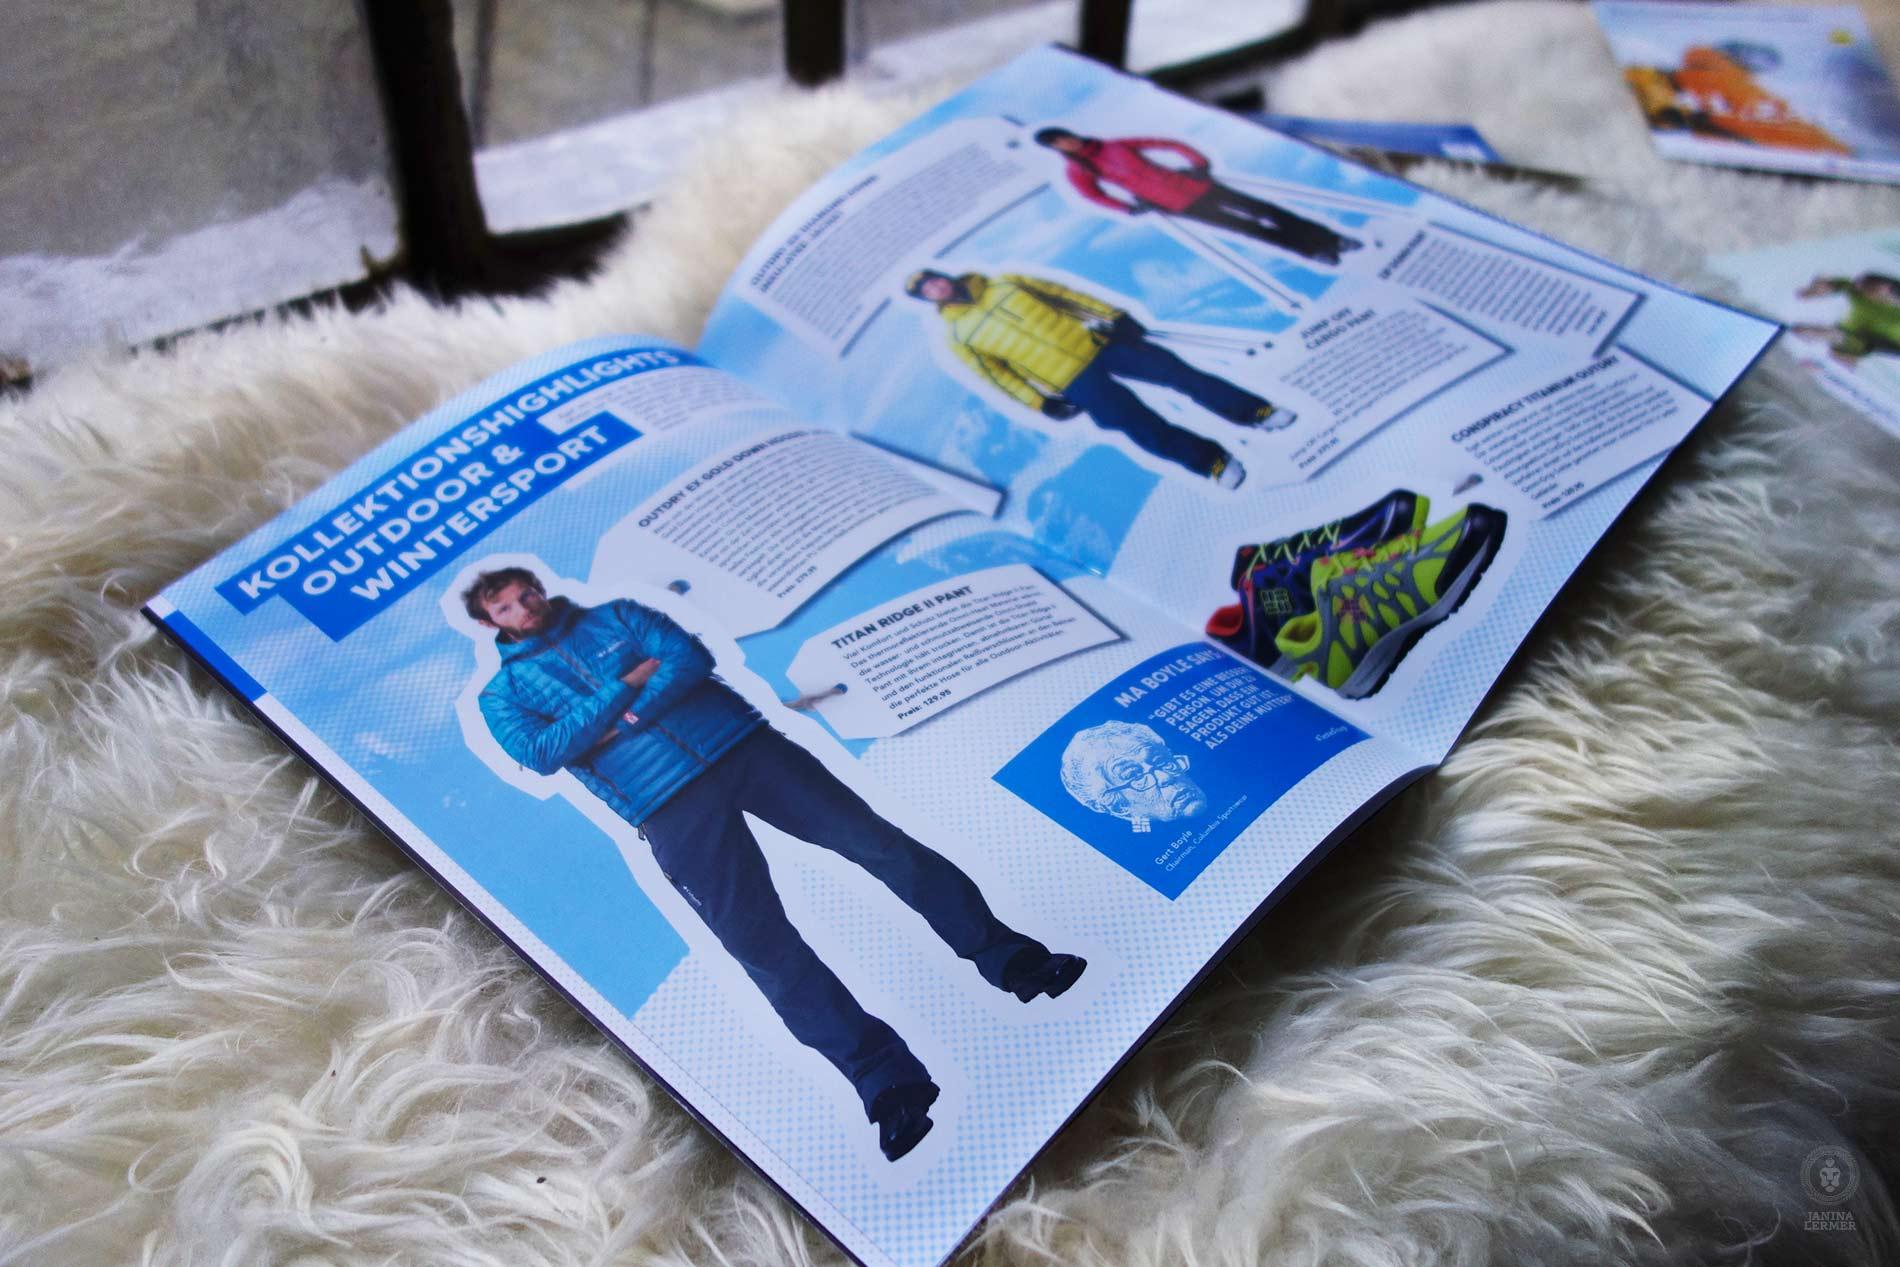 Janina-Lermer-Markenkommunikation-Brand-communication-Columbia-Presskit-Editorialdesing-Innenseiten-Produkte-Products-Winter-16